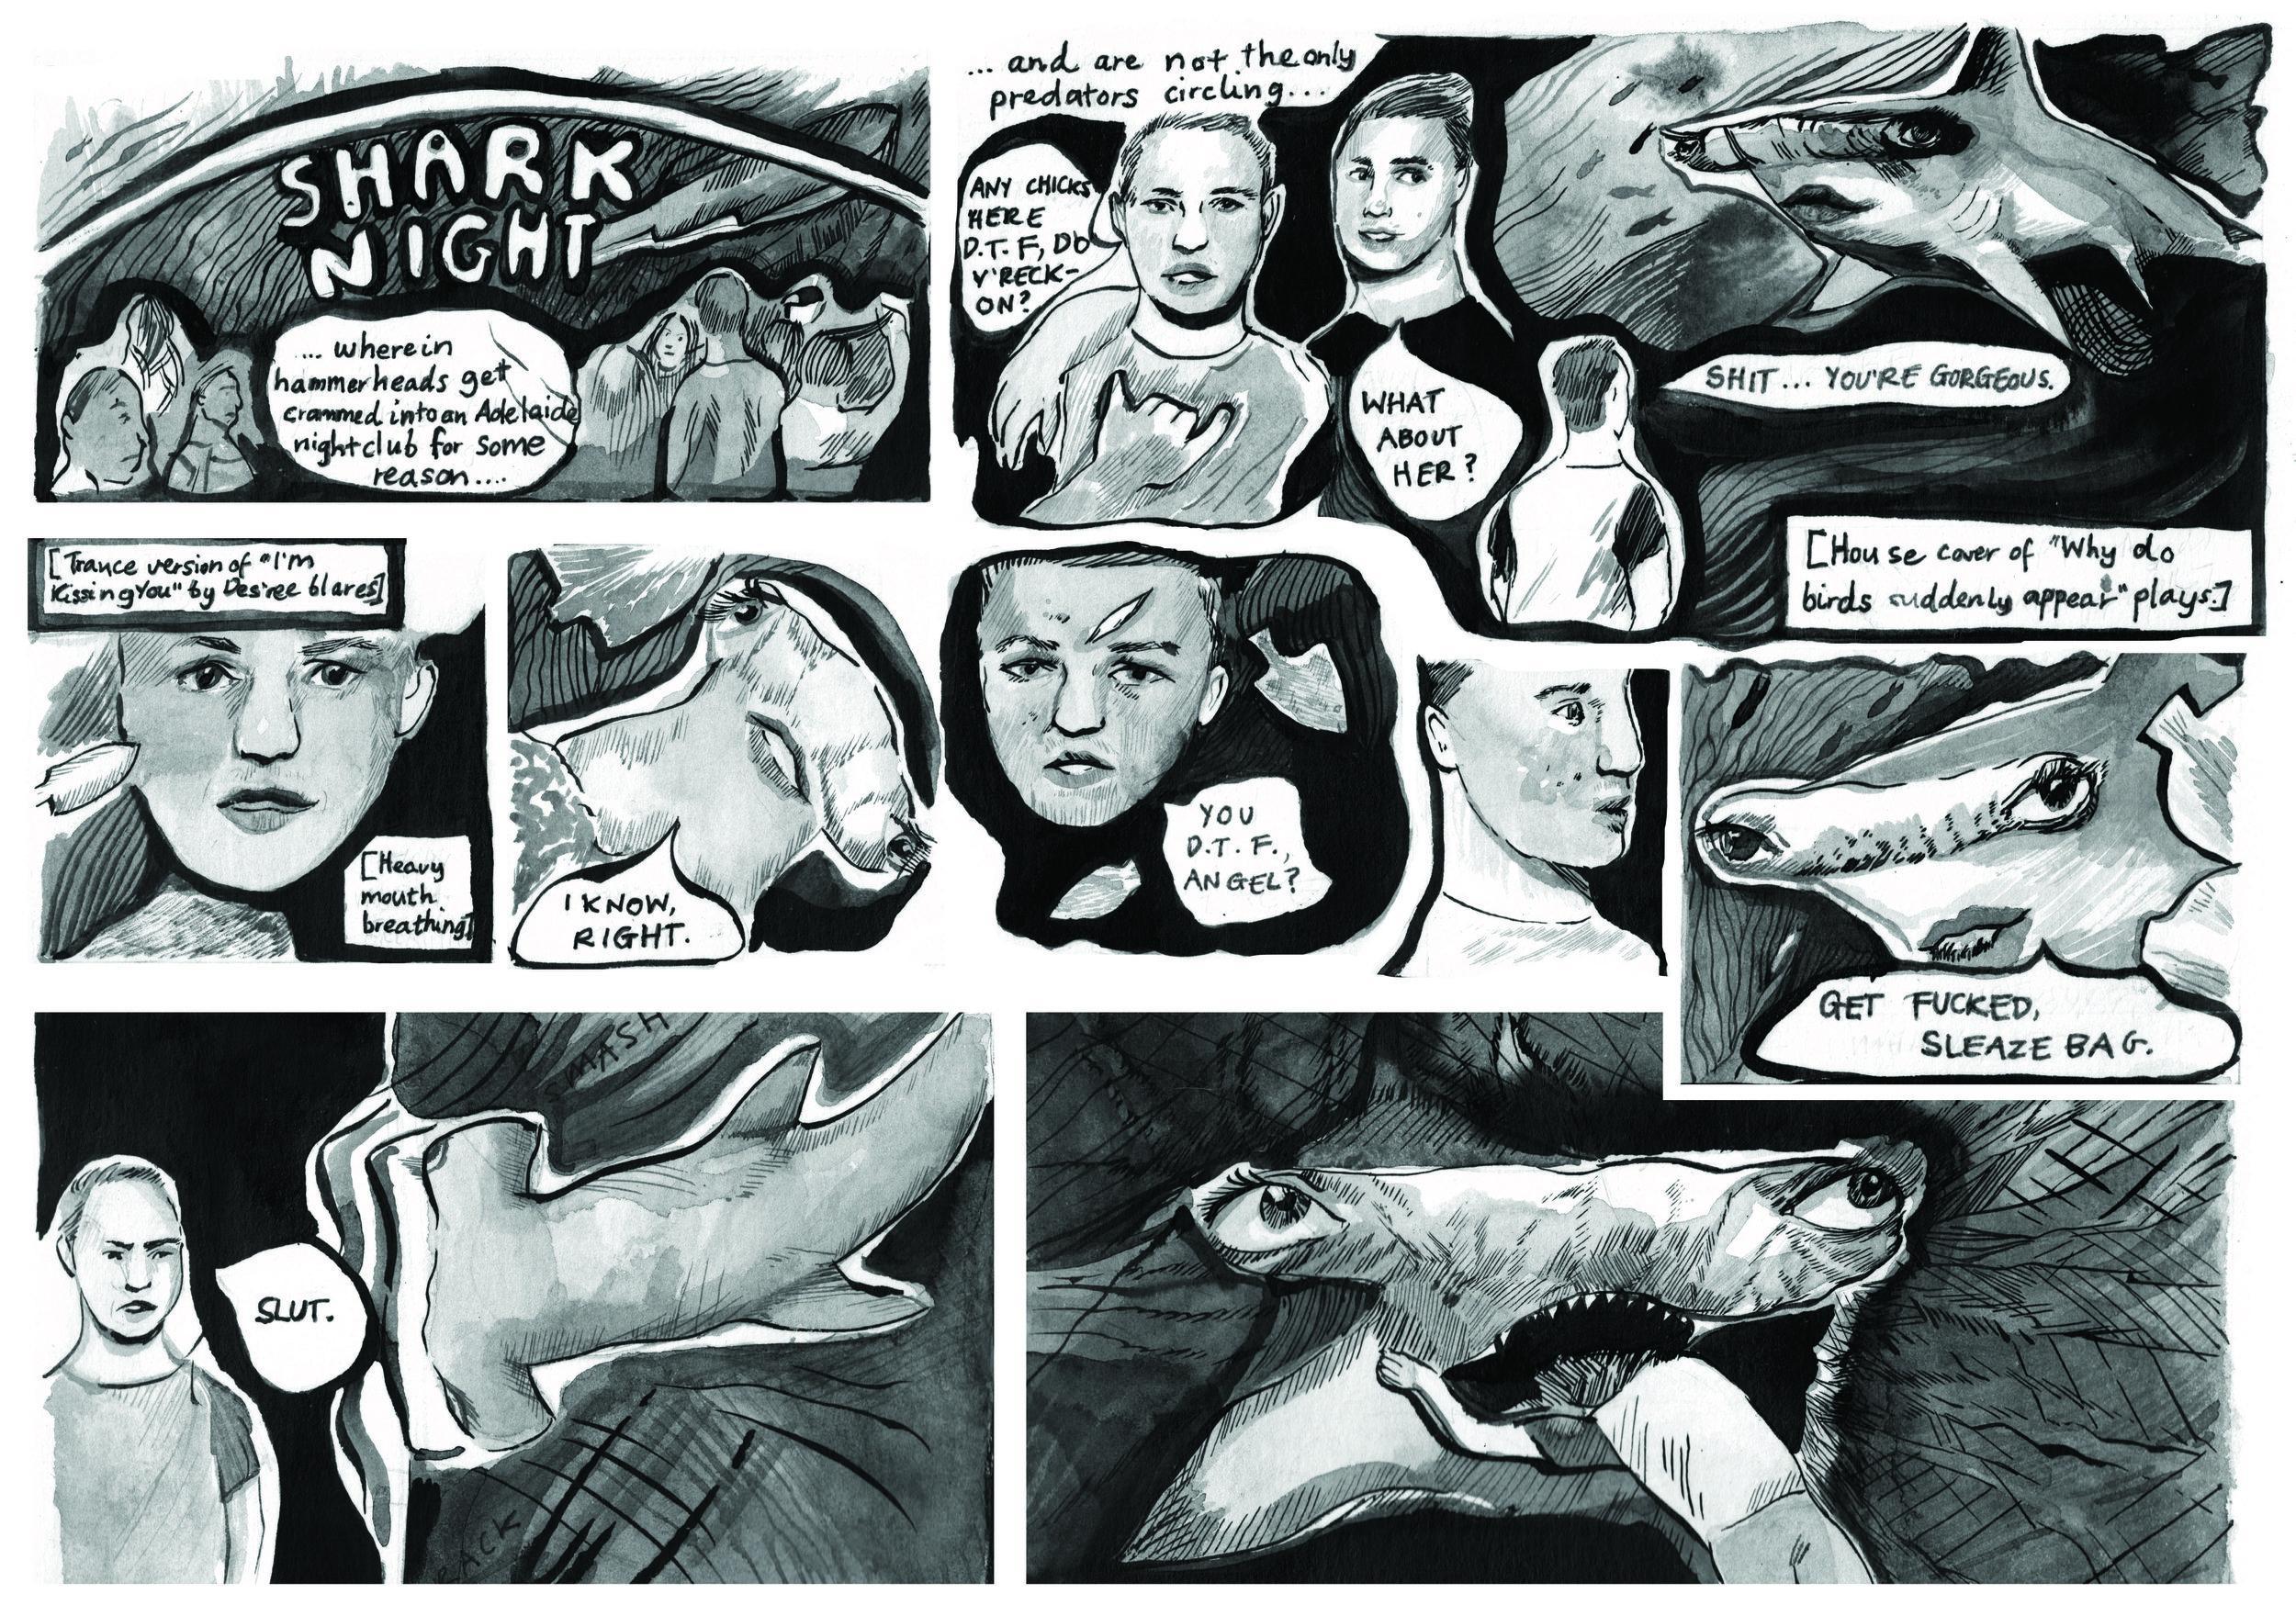 SHARK NIGHT - By Eloise Grills